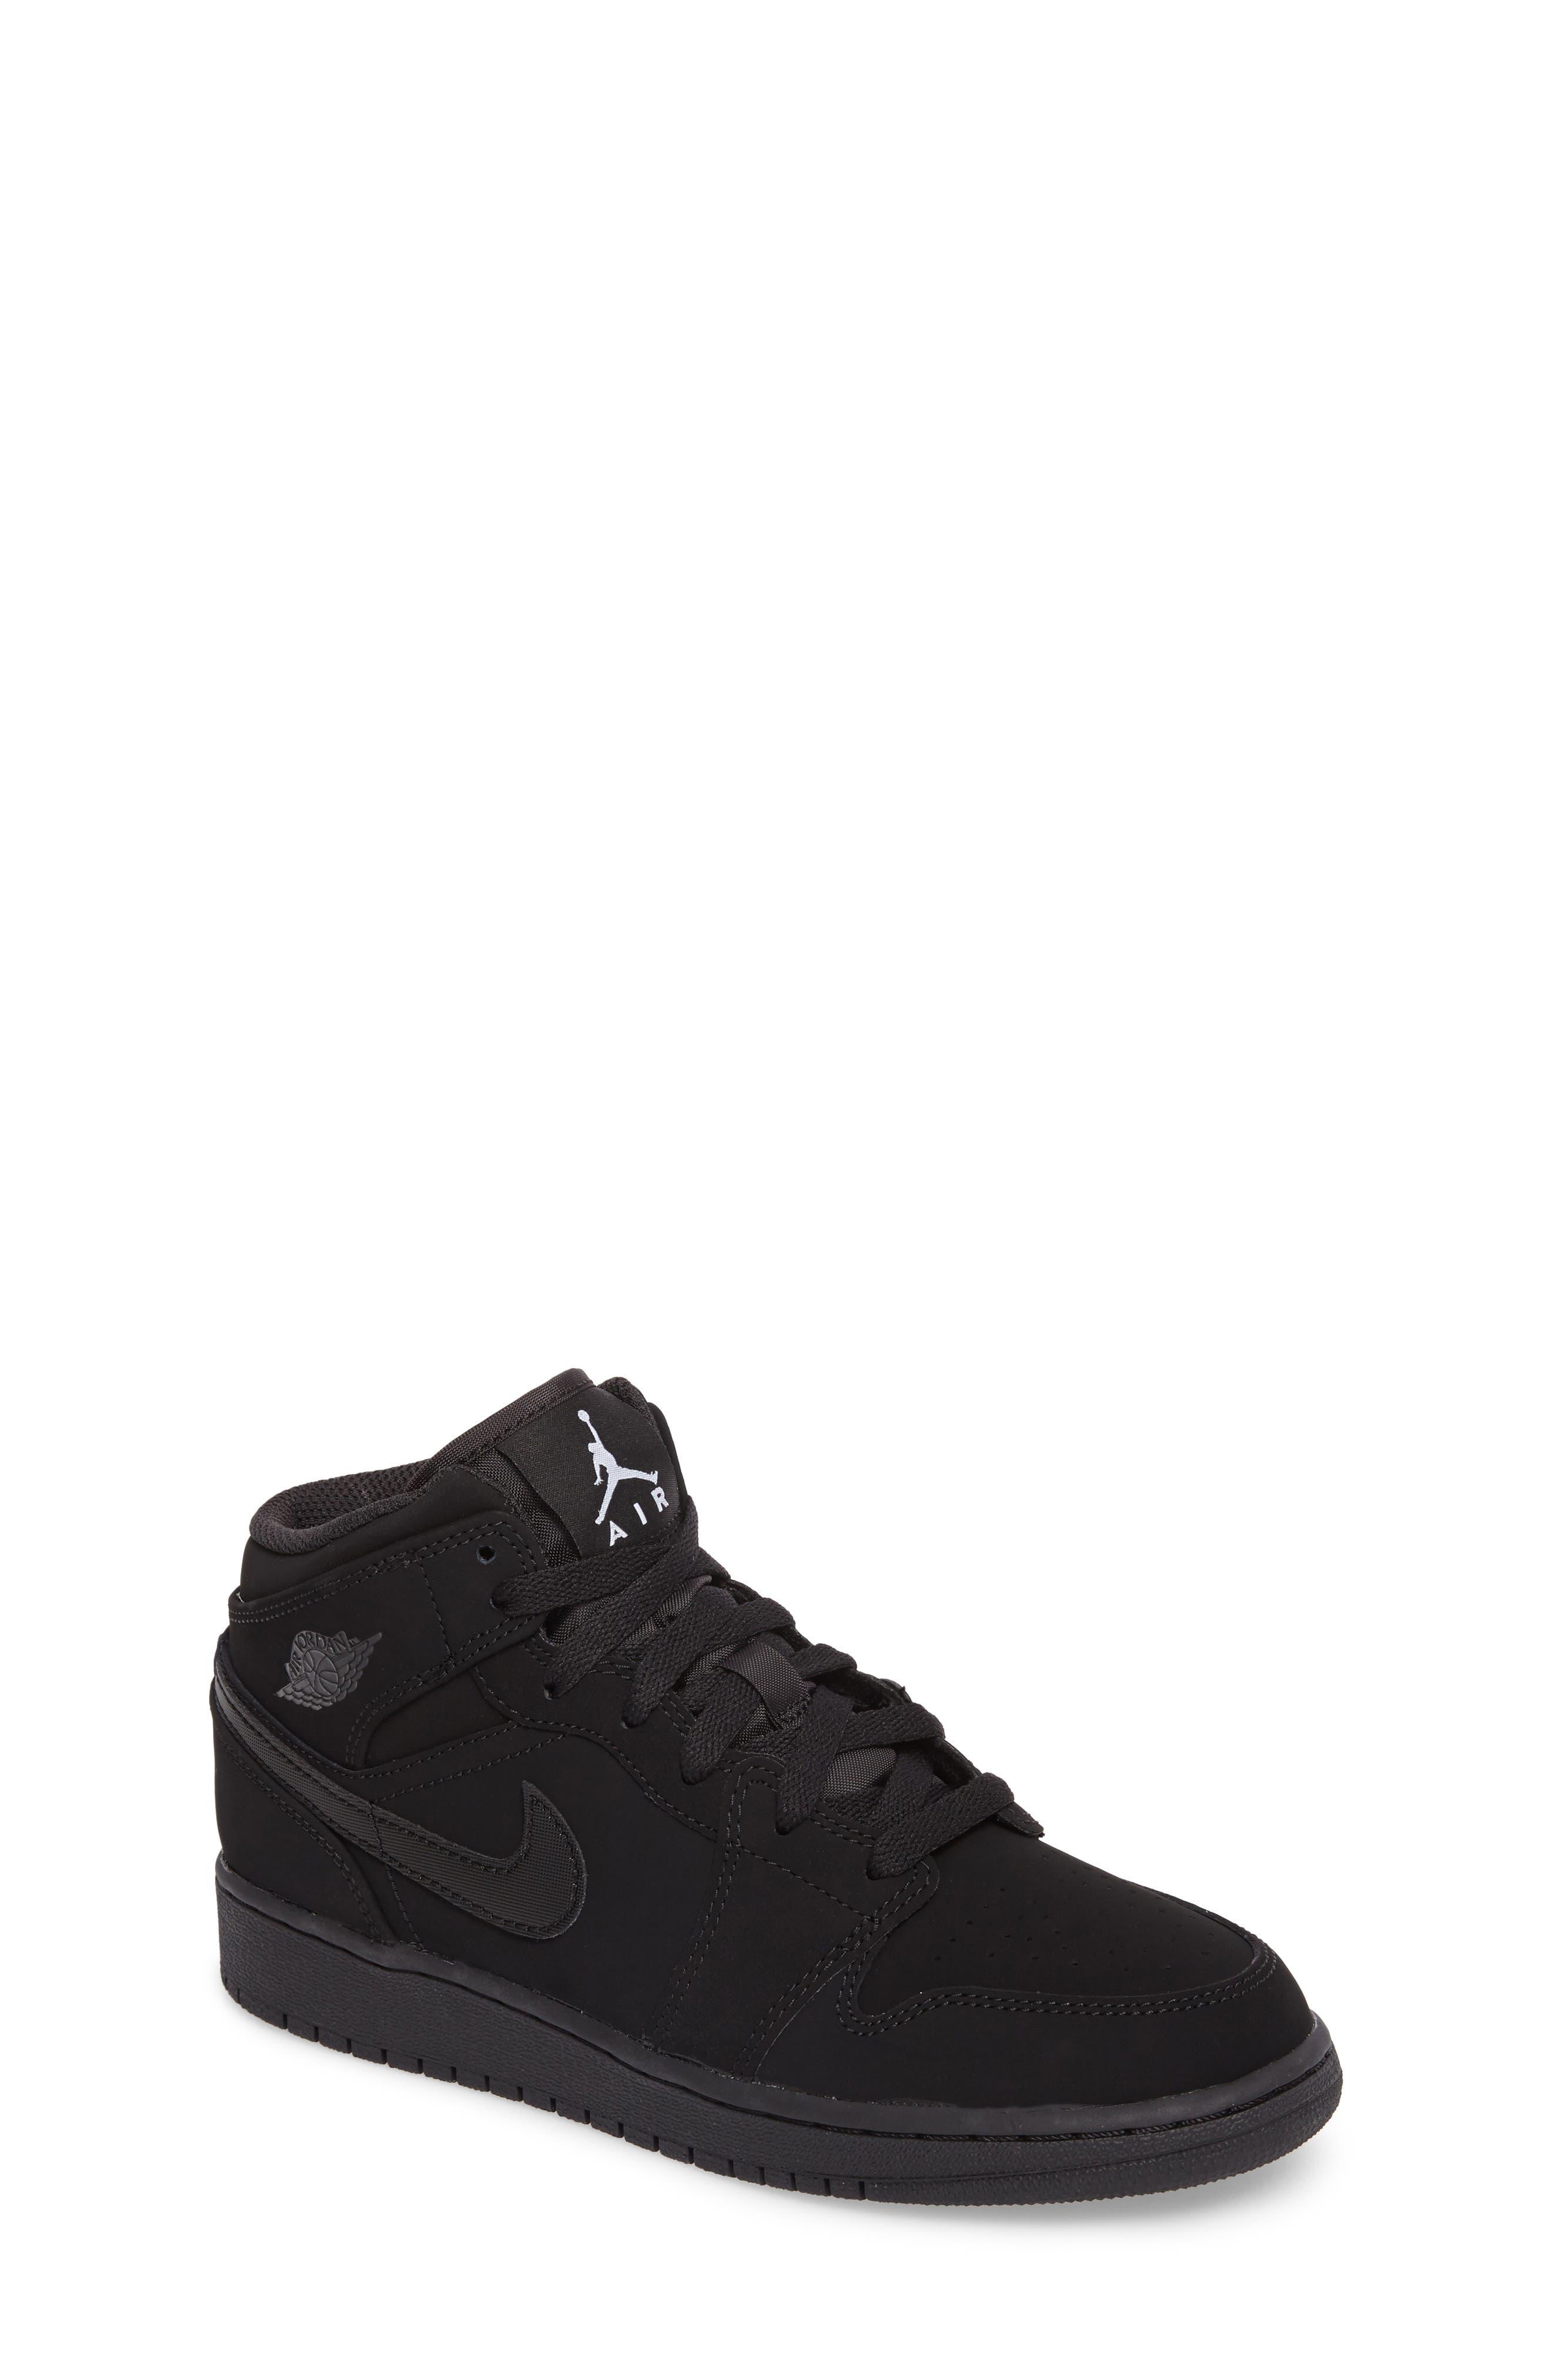 Nike 'Air Jordan 1 Mid' Sneaker,                             Main thumbnail 1, color,                             Black